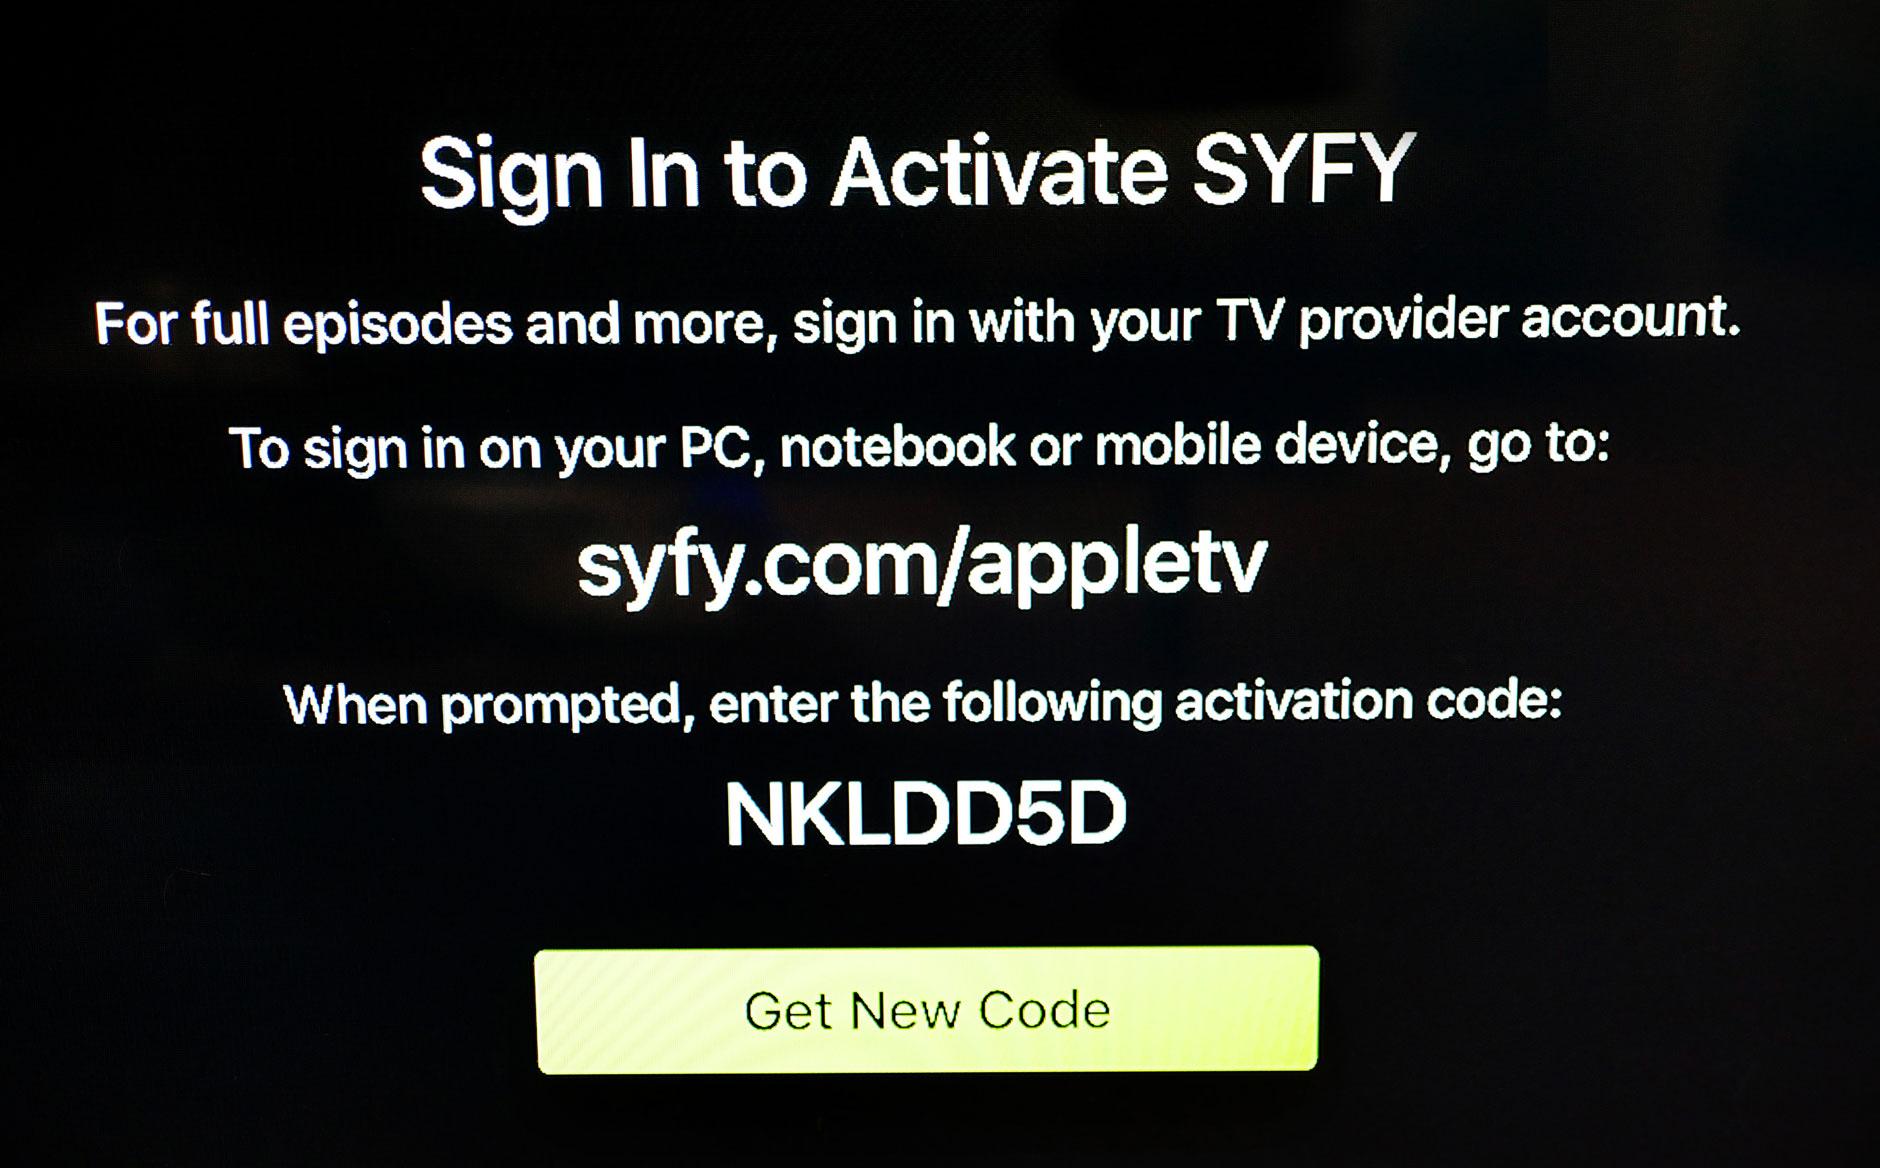 Syfy login screen on an AppleTV